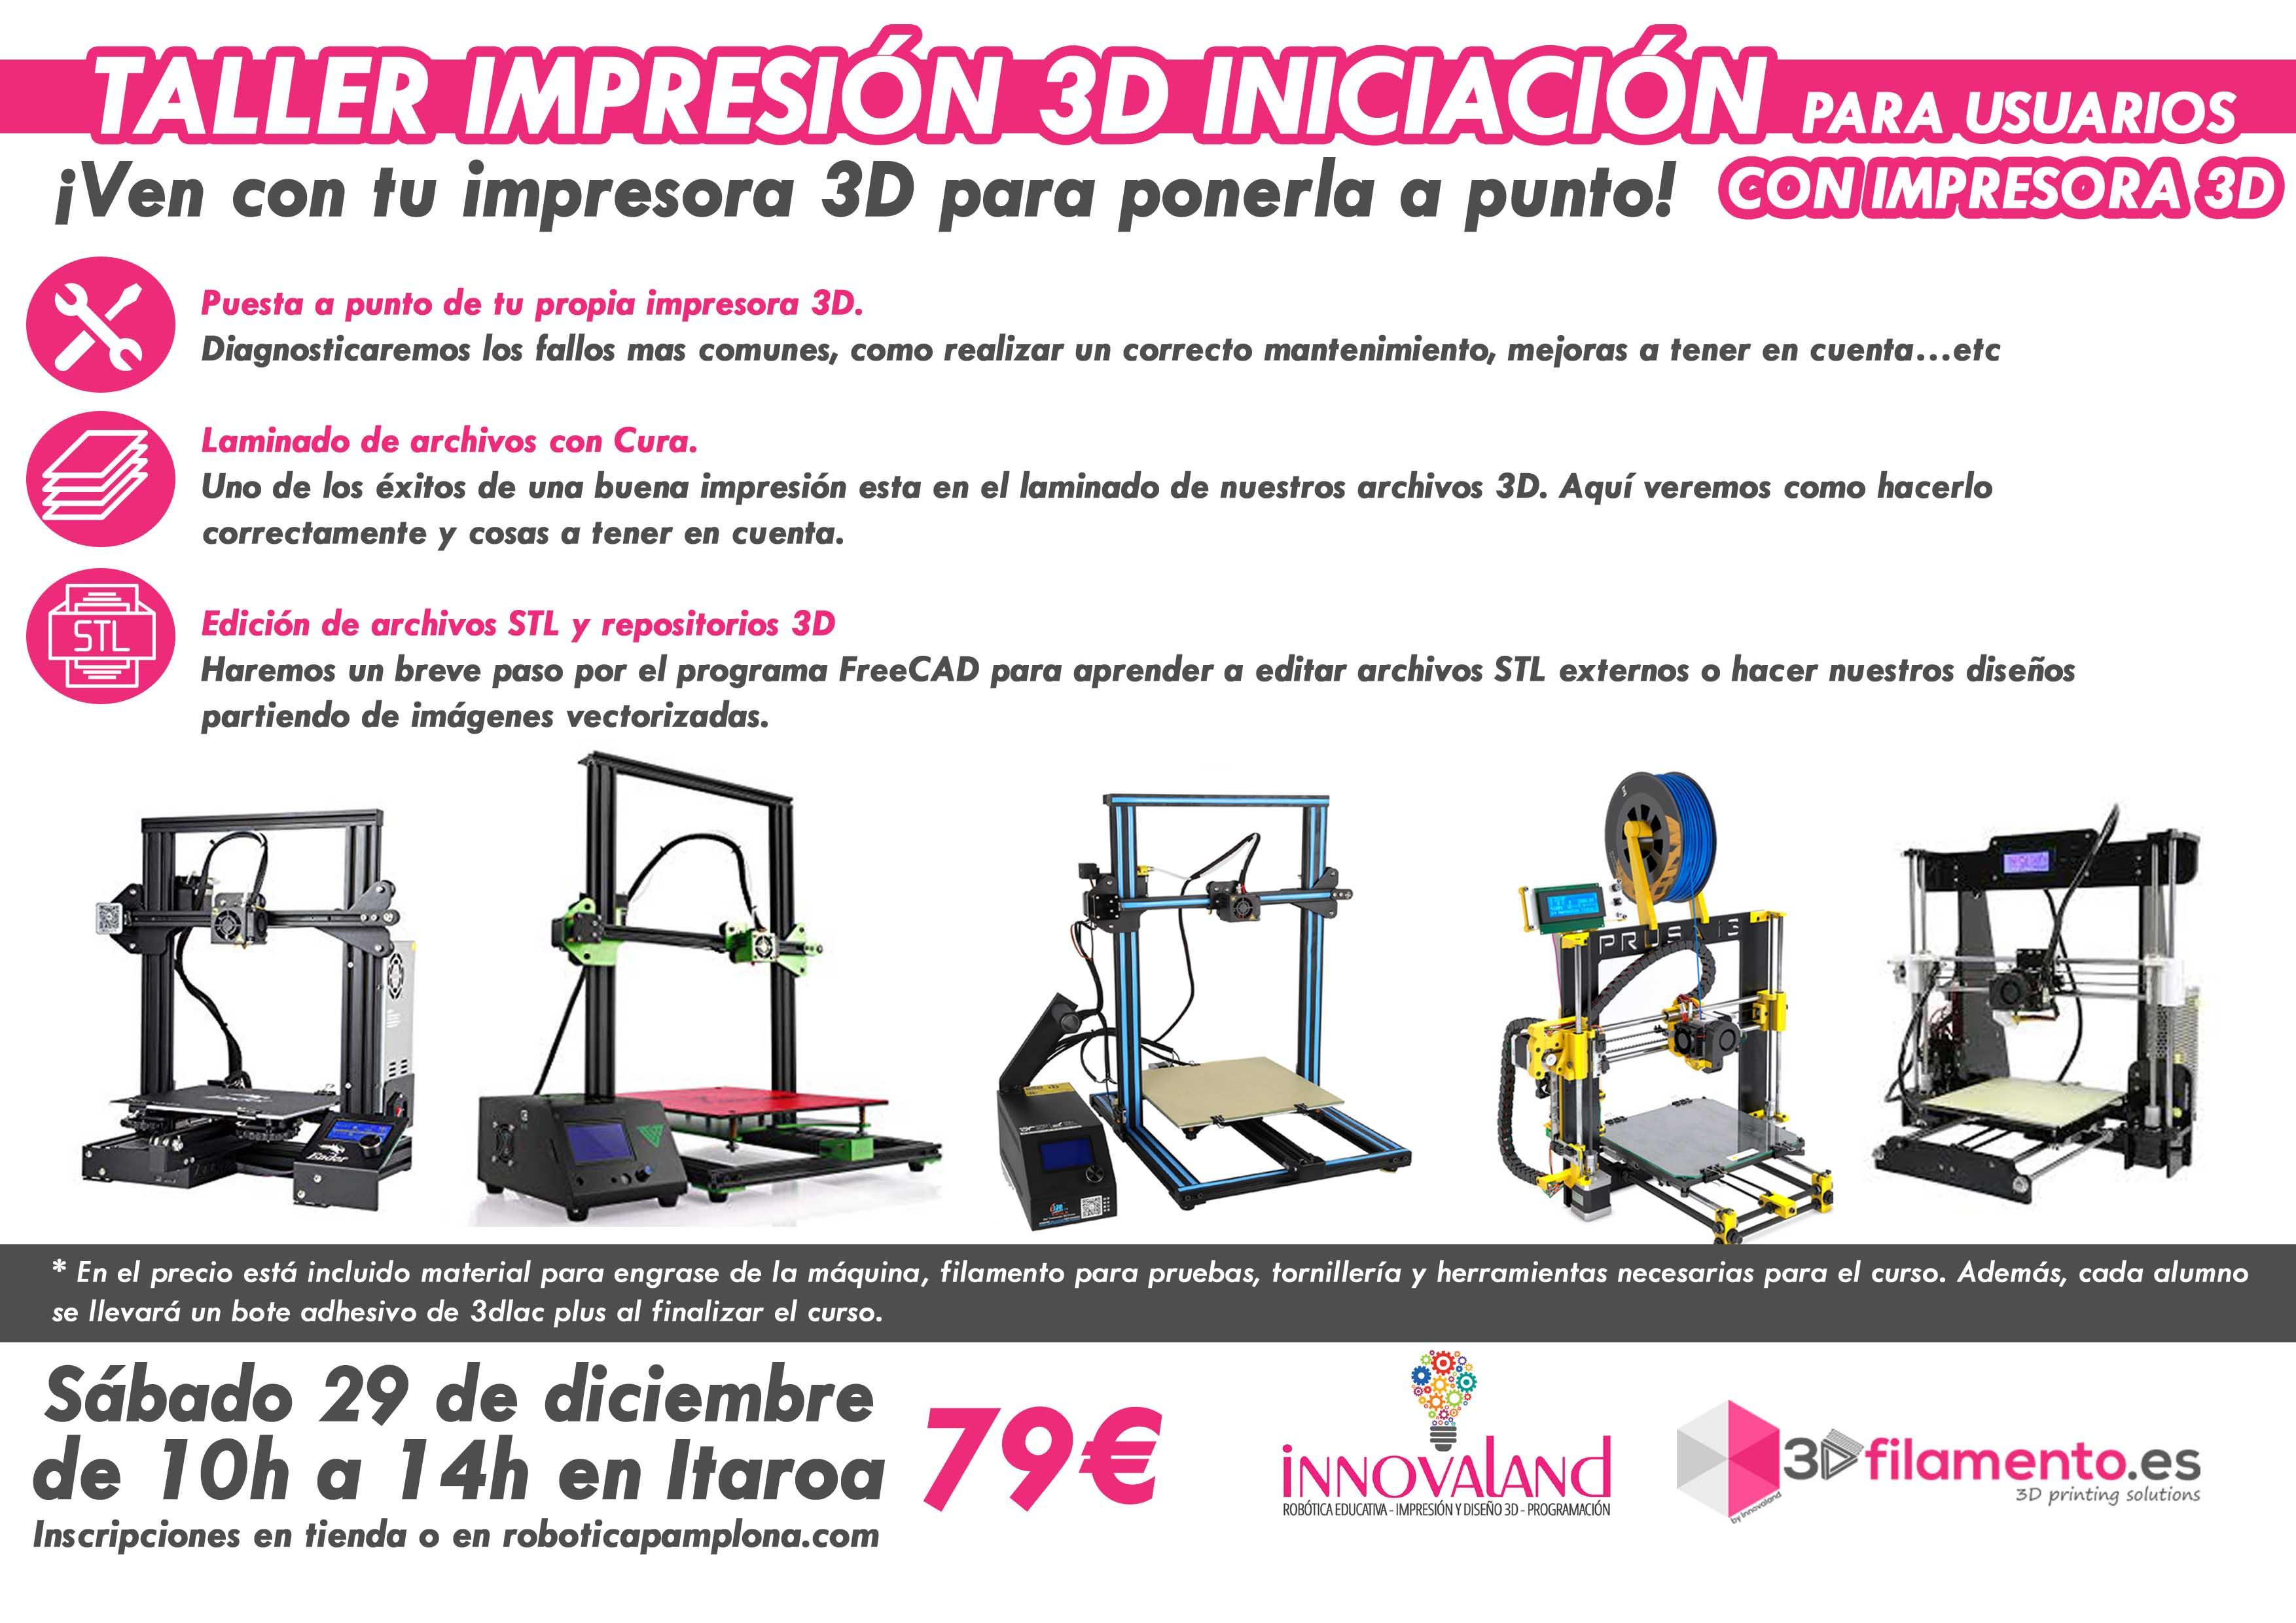 IMRPESION 3D 2018